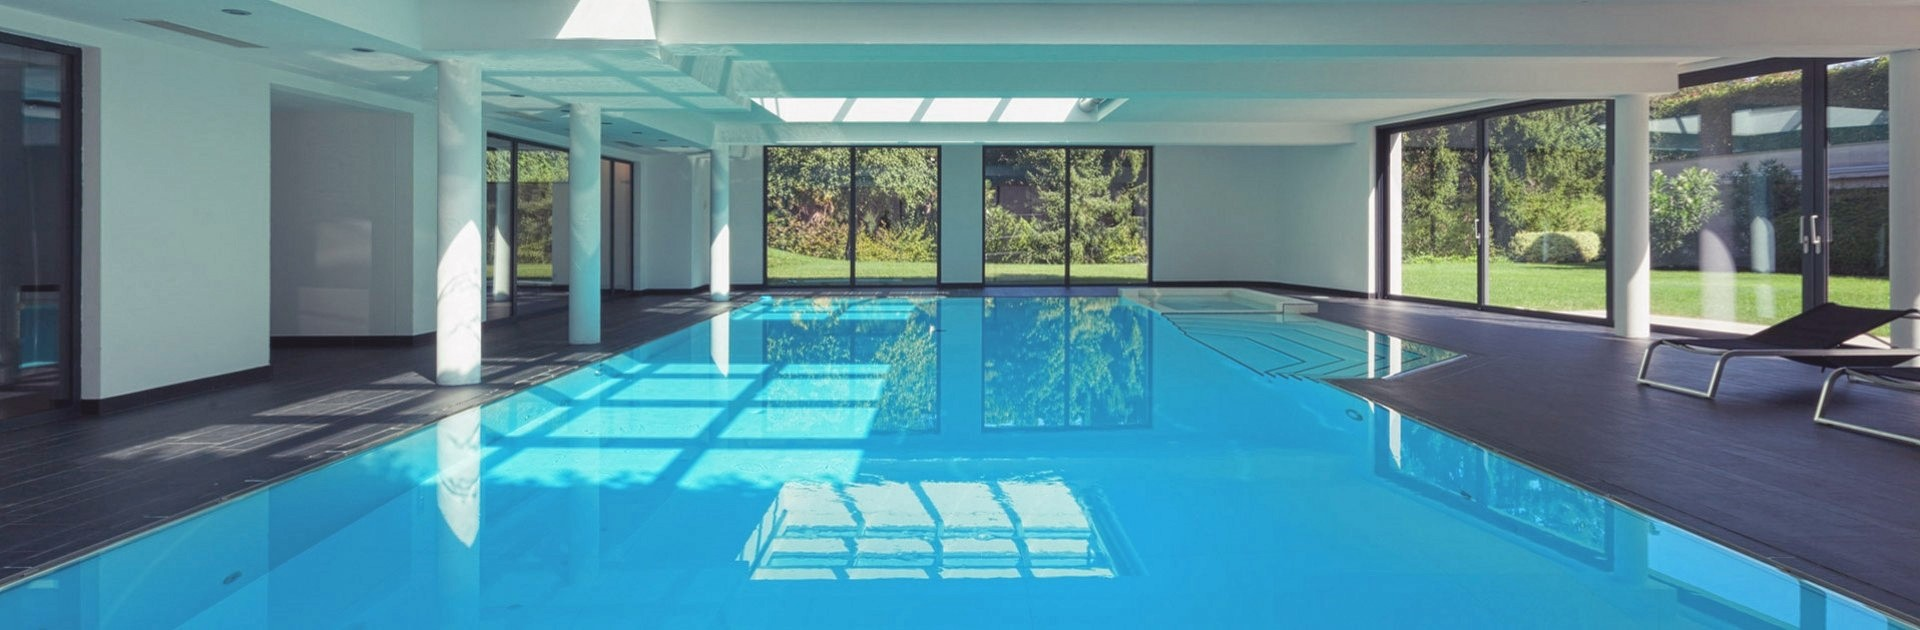 Calentadores solares para piscinas